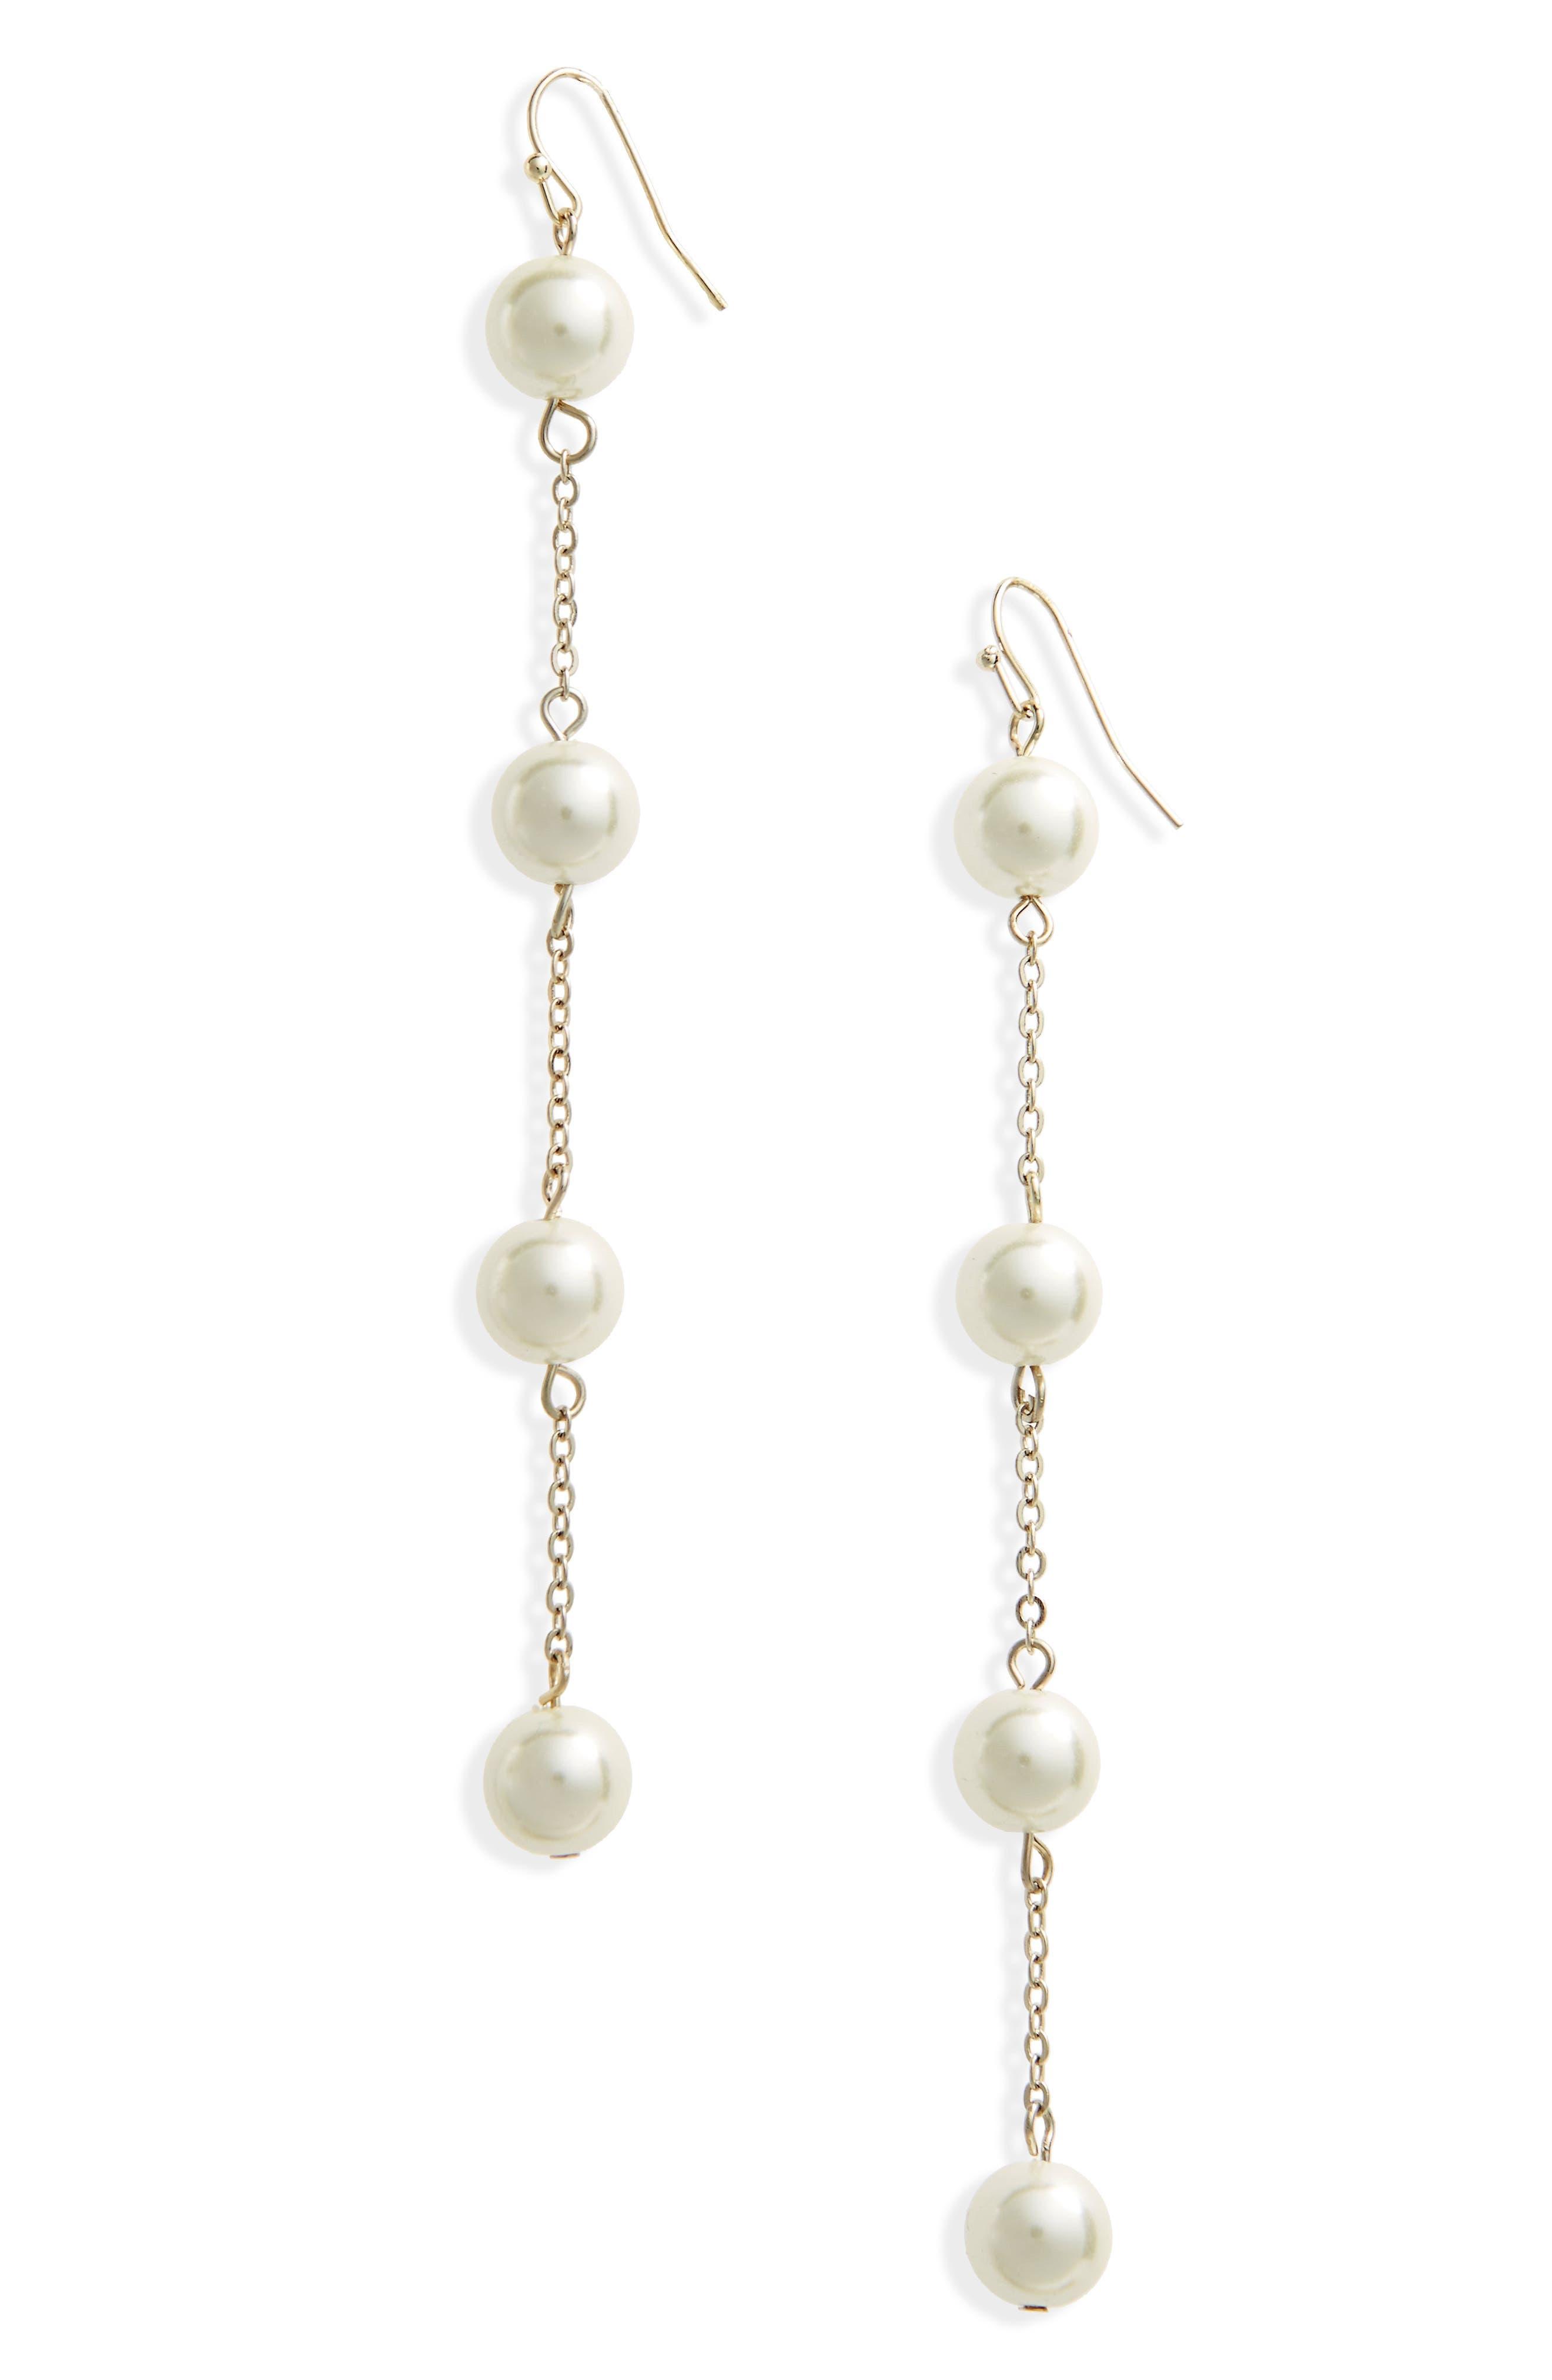 Imitation Pearl Drop Earrings,                             Main thumbnail 1, color,                             Cream